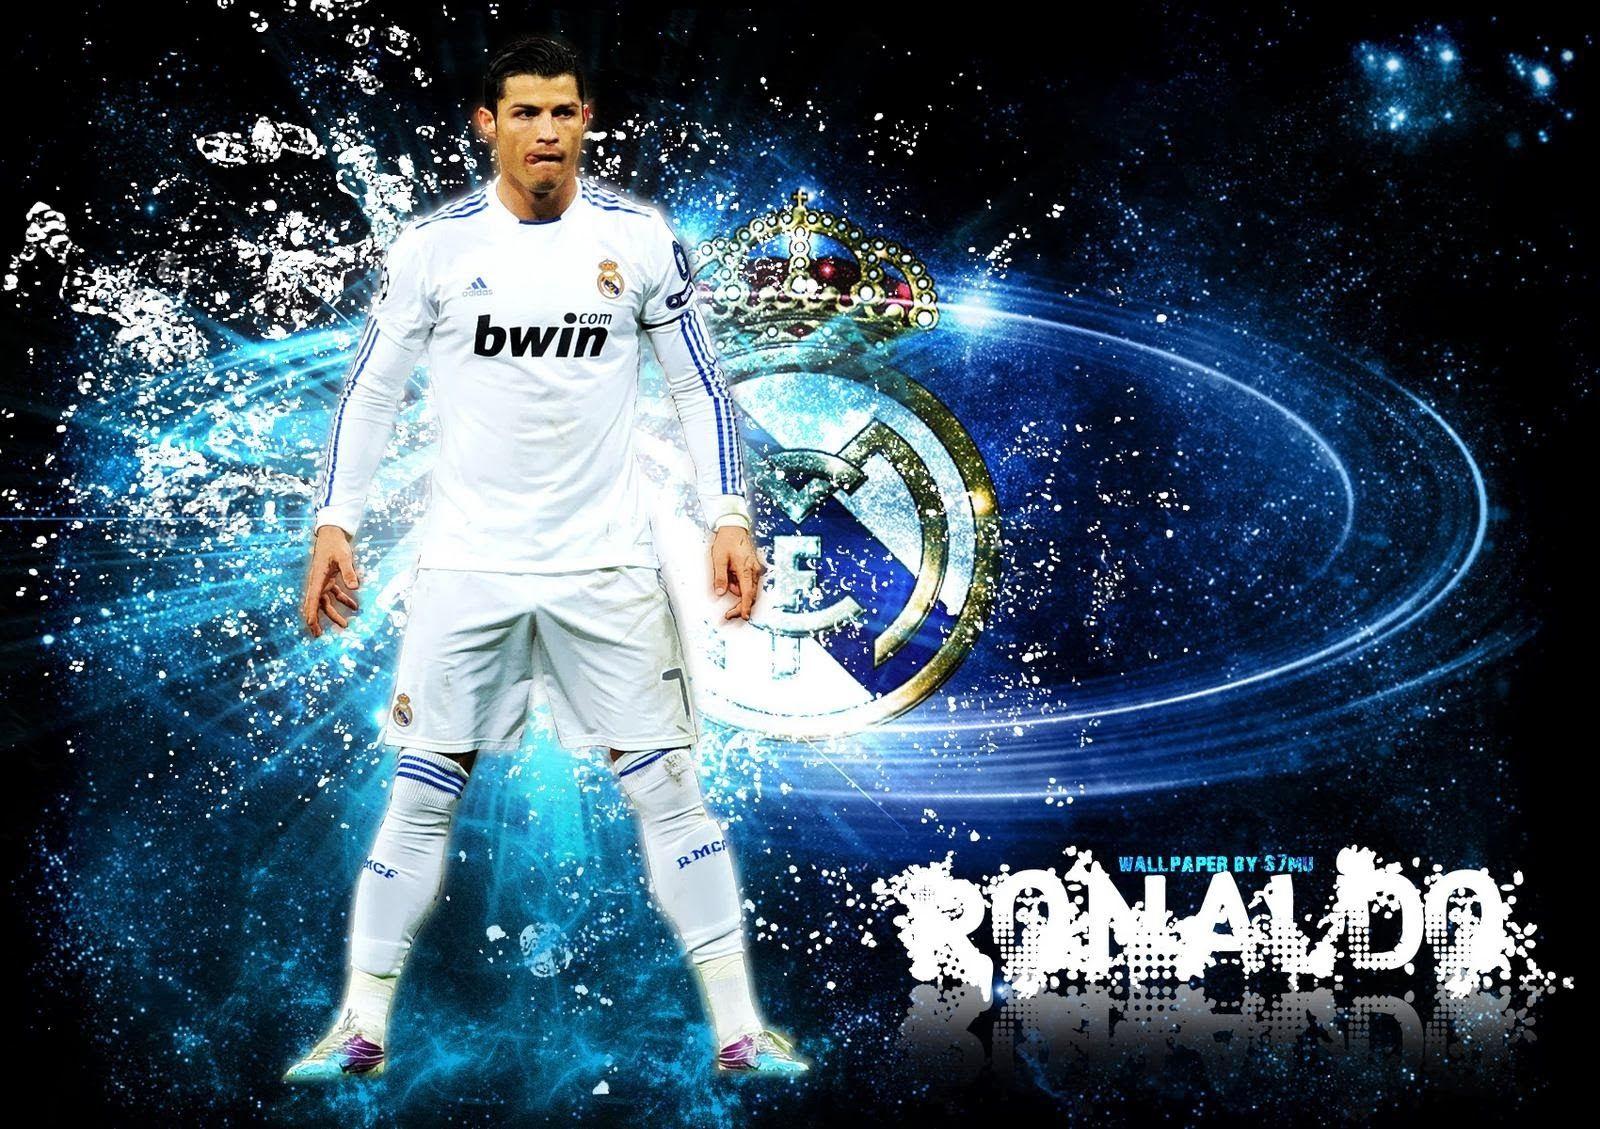 Cristiano Ronaldo Wallpapers 2017 2018 In HD